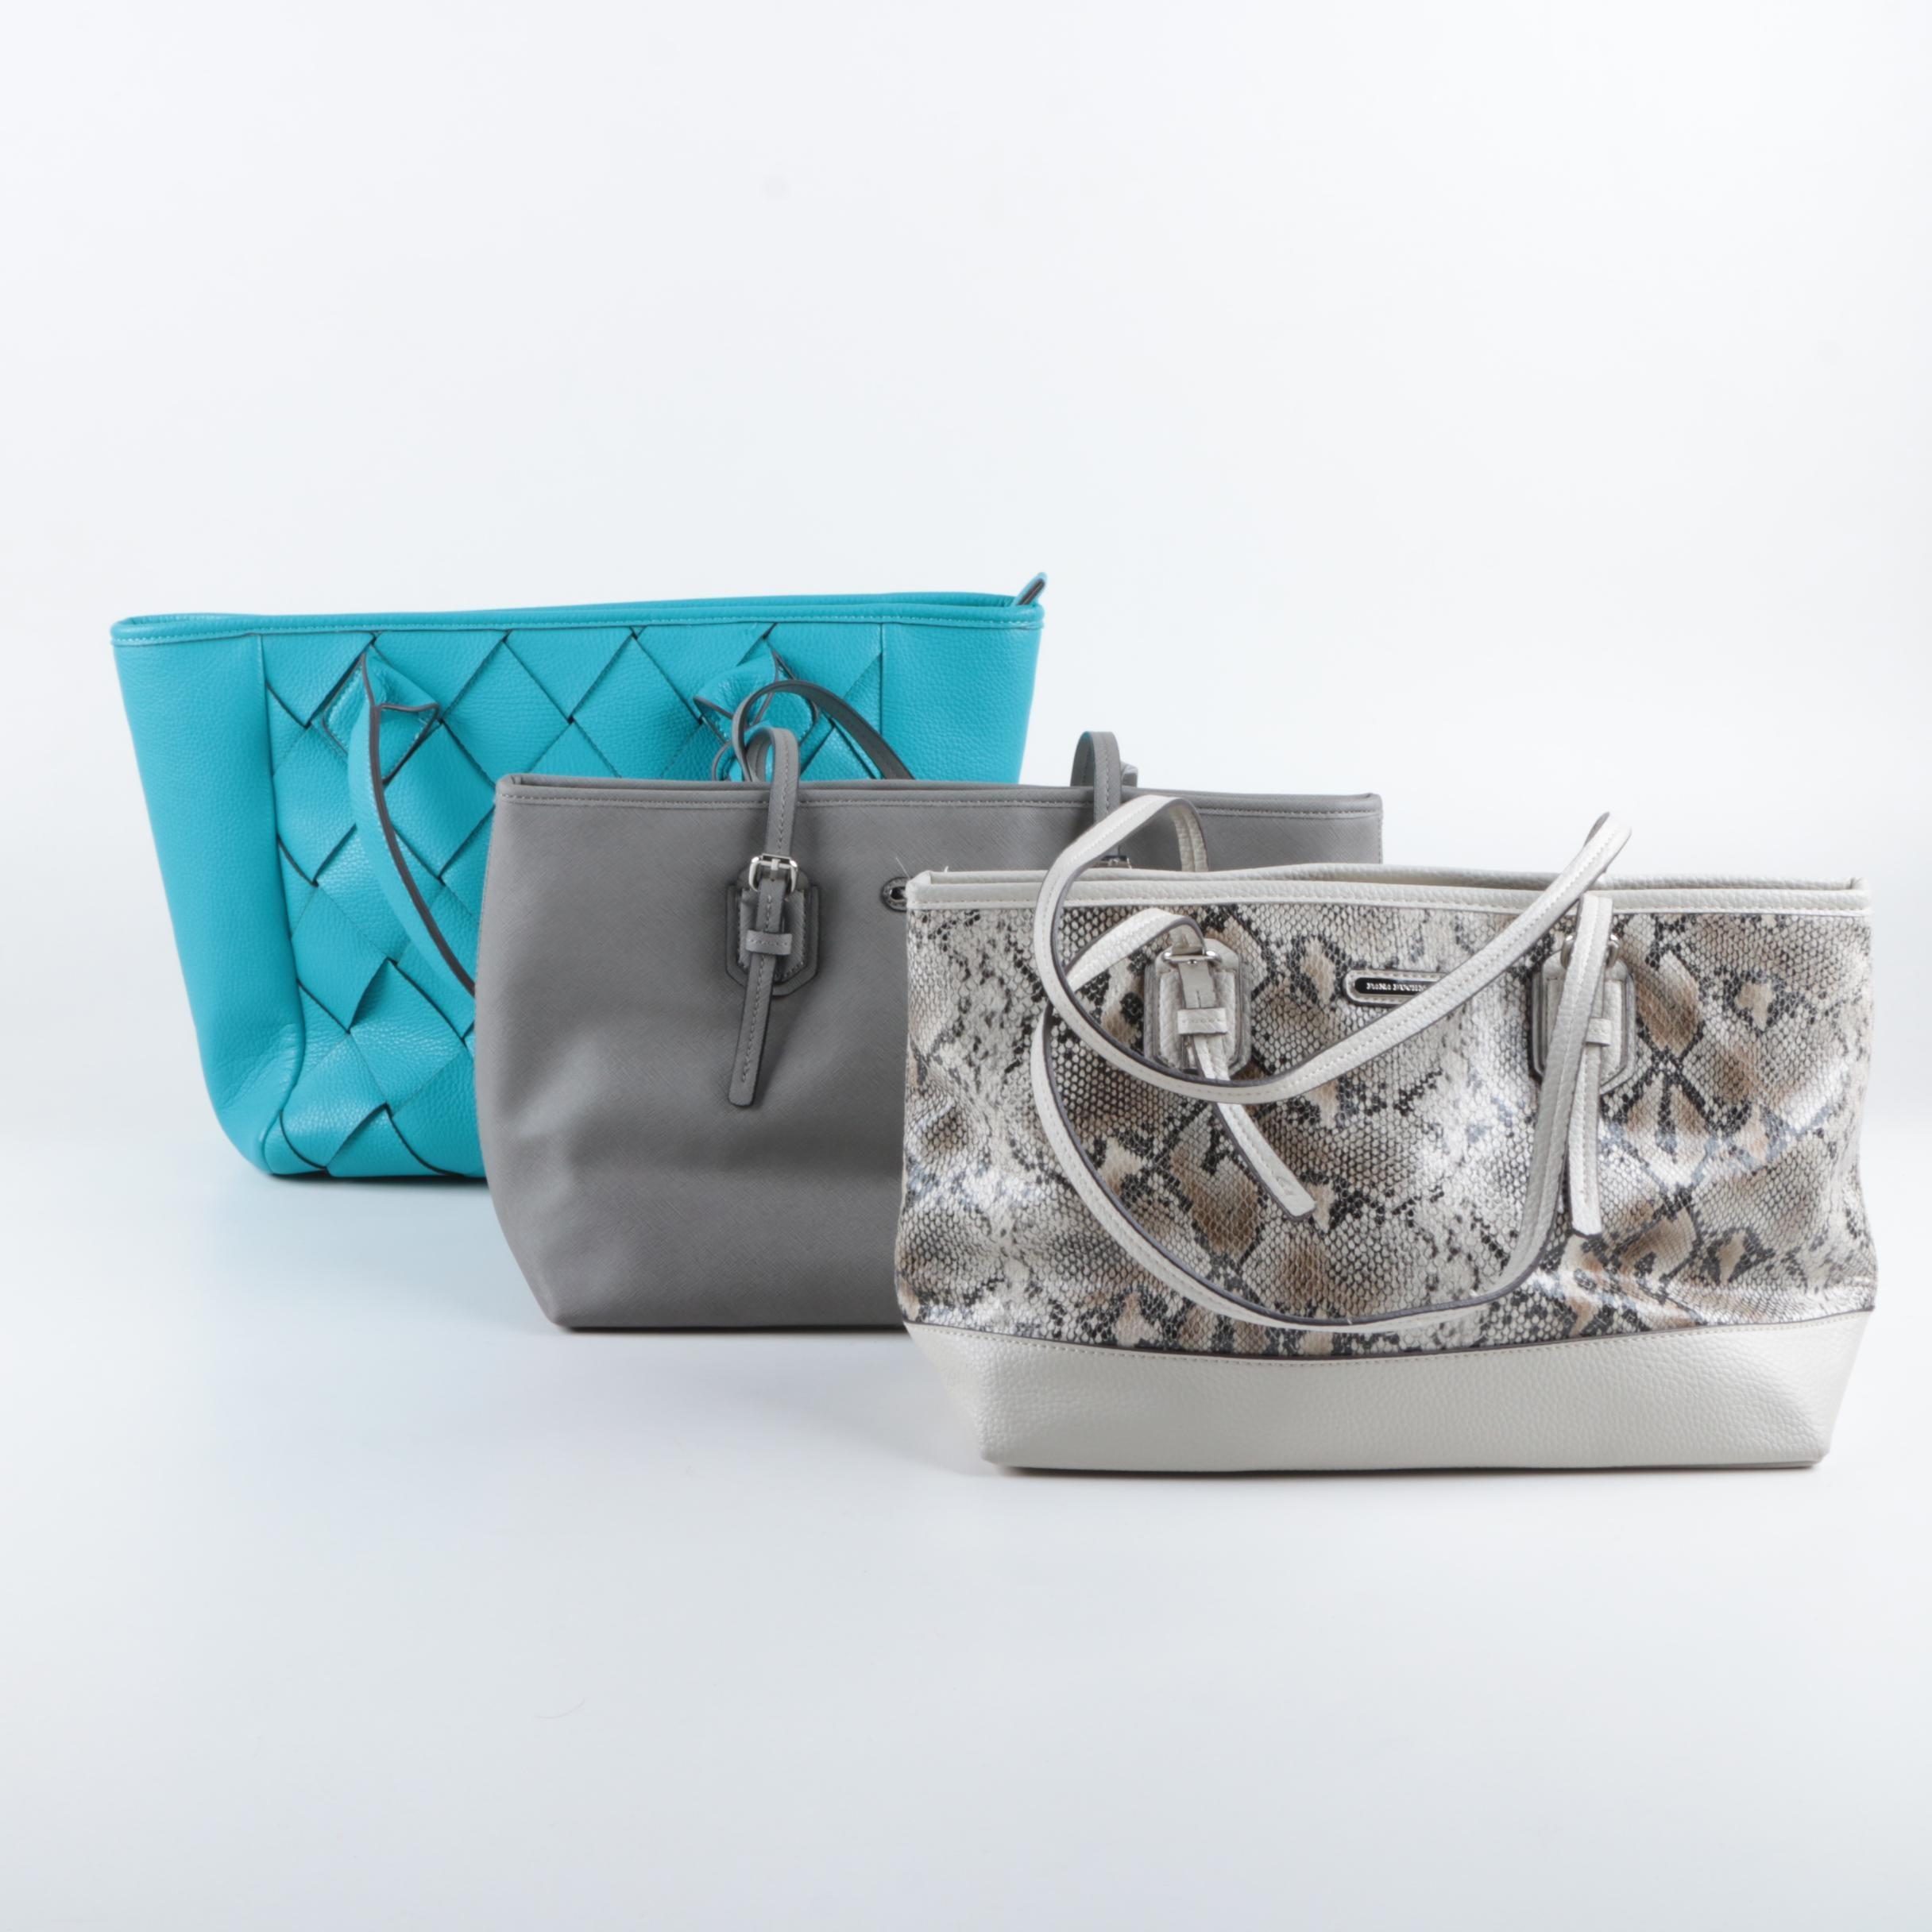 Women's Handbags Including Dana Buchman